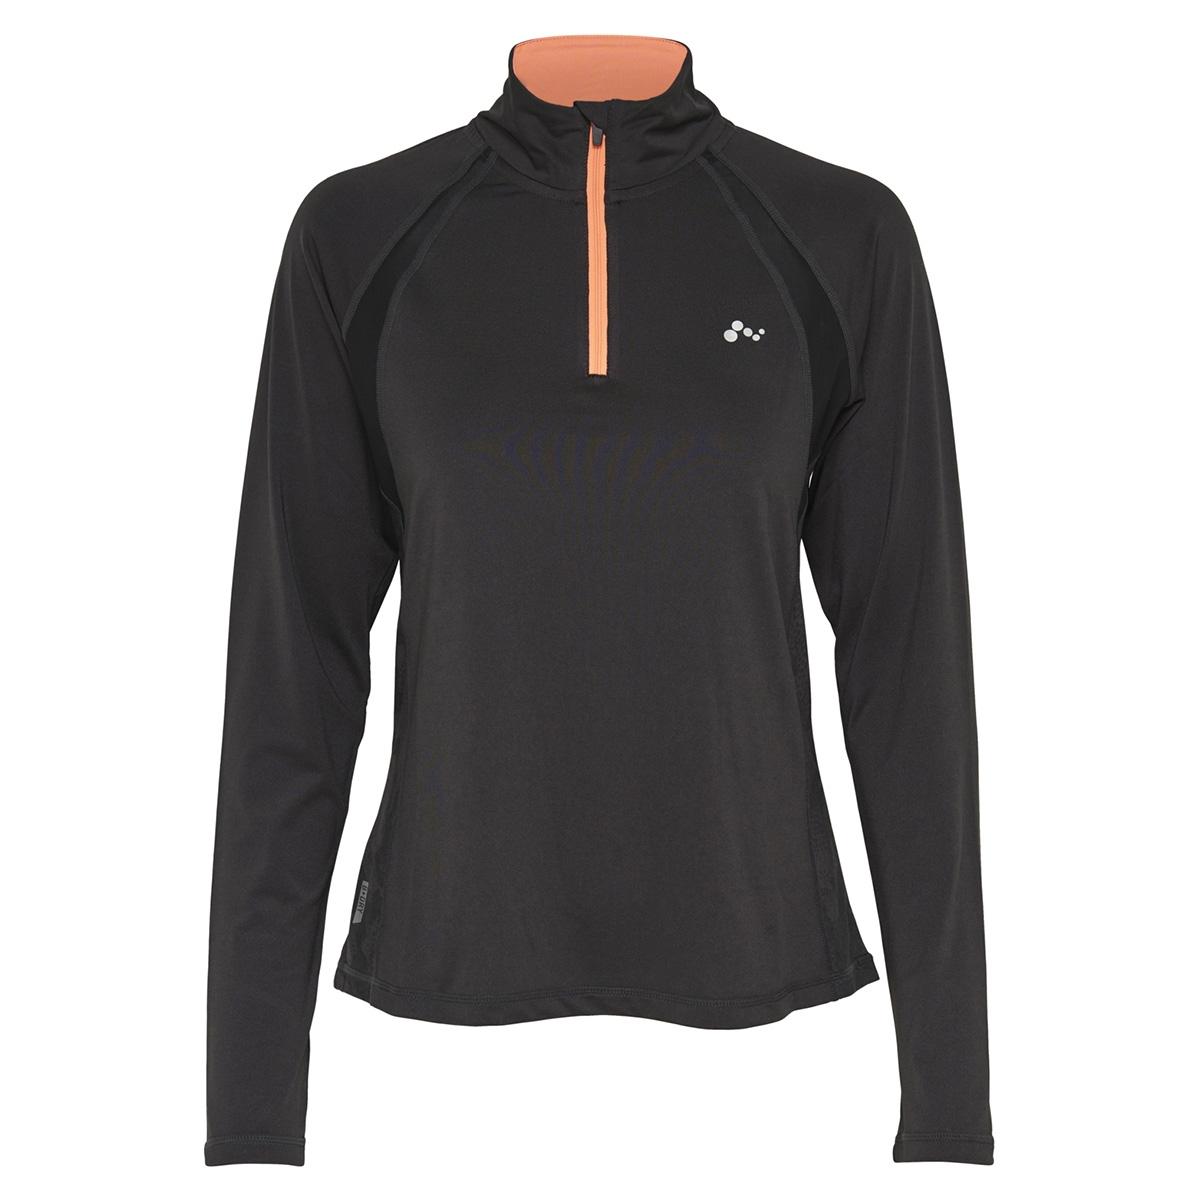 onpplay aop ls training tee prs 15159701 only play sport shirt dark shadow